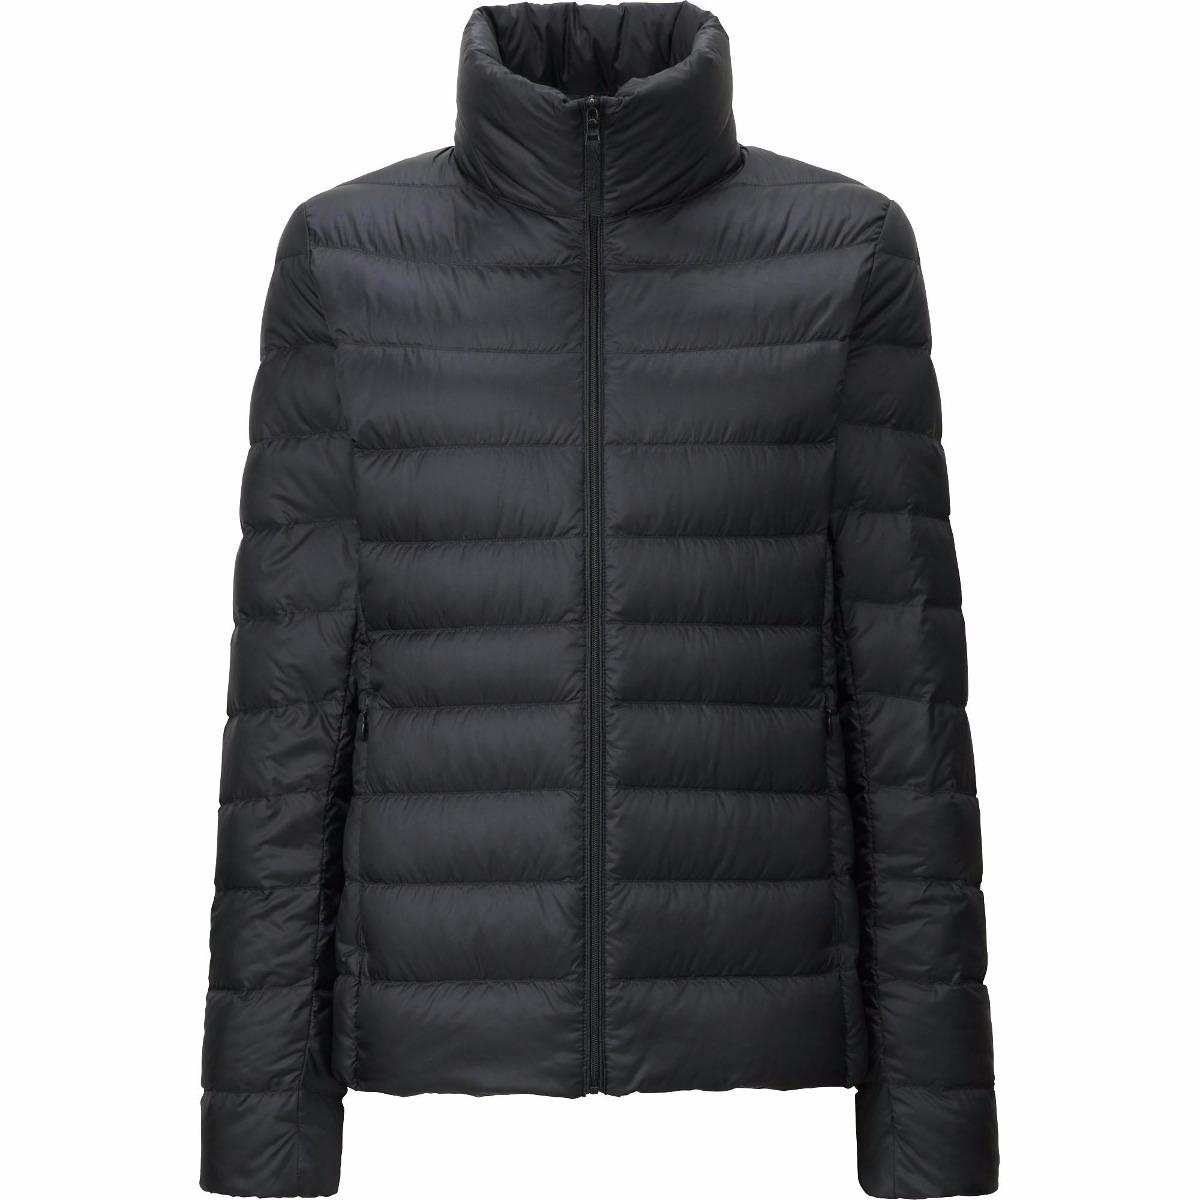 Uniqlo Ultra Light Down Jacket Black